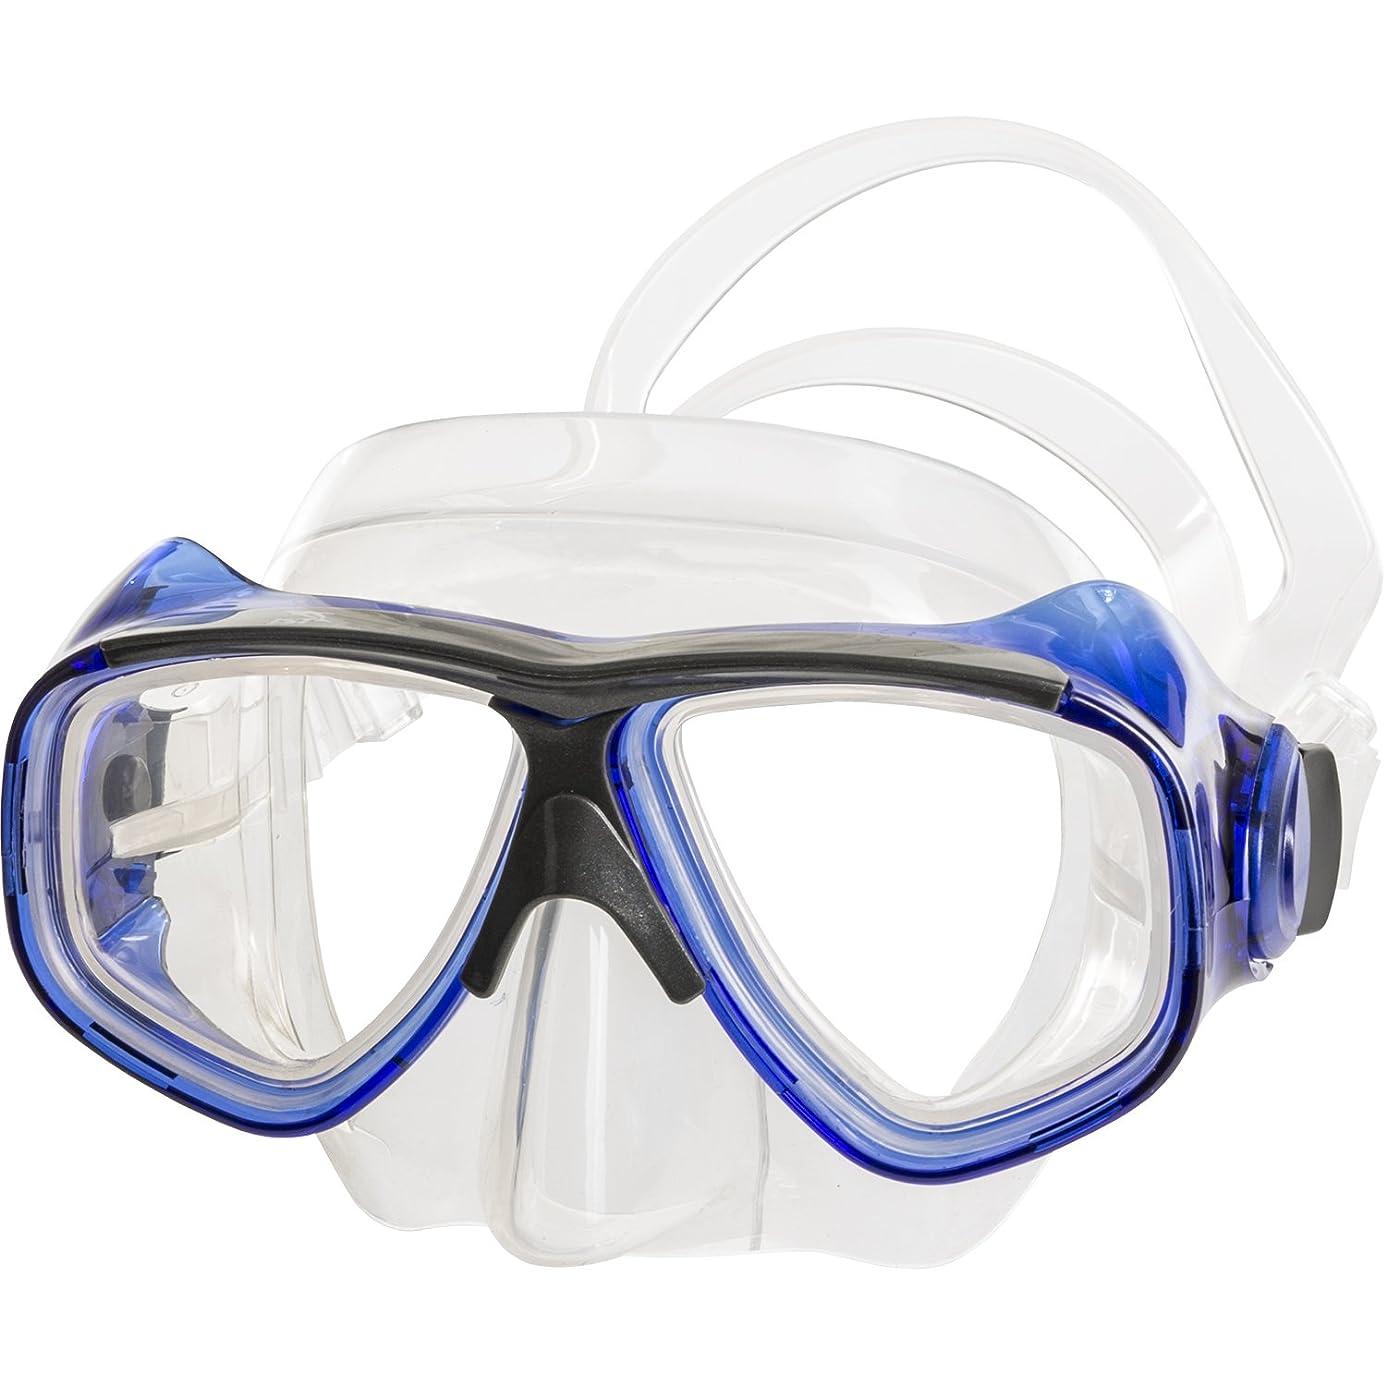 IST Prescription Mask- Optical Corrective Scuba Diving Snorkeling Mask - Rx Prescription- Bk, Yellow, Blue, Bk Silicon